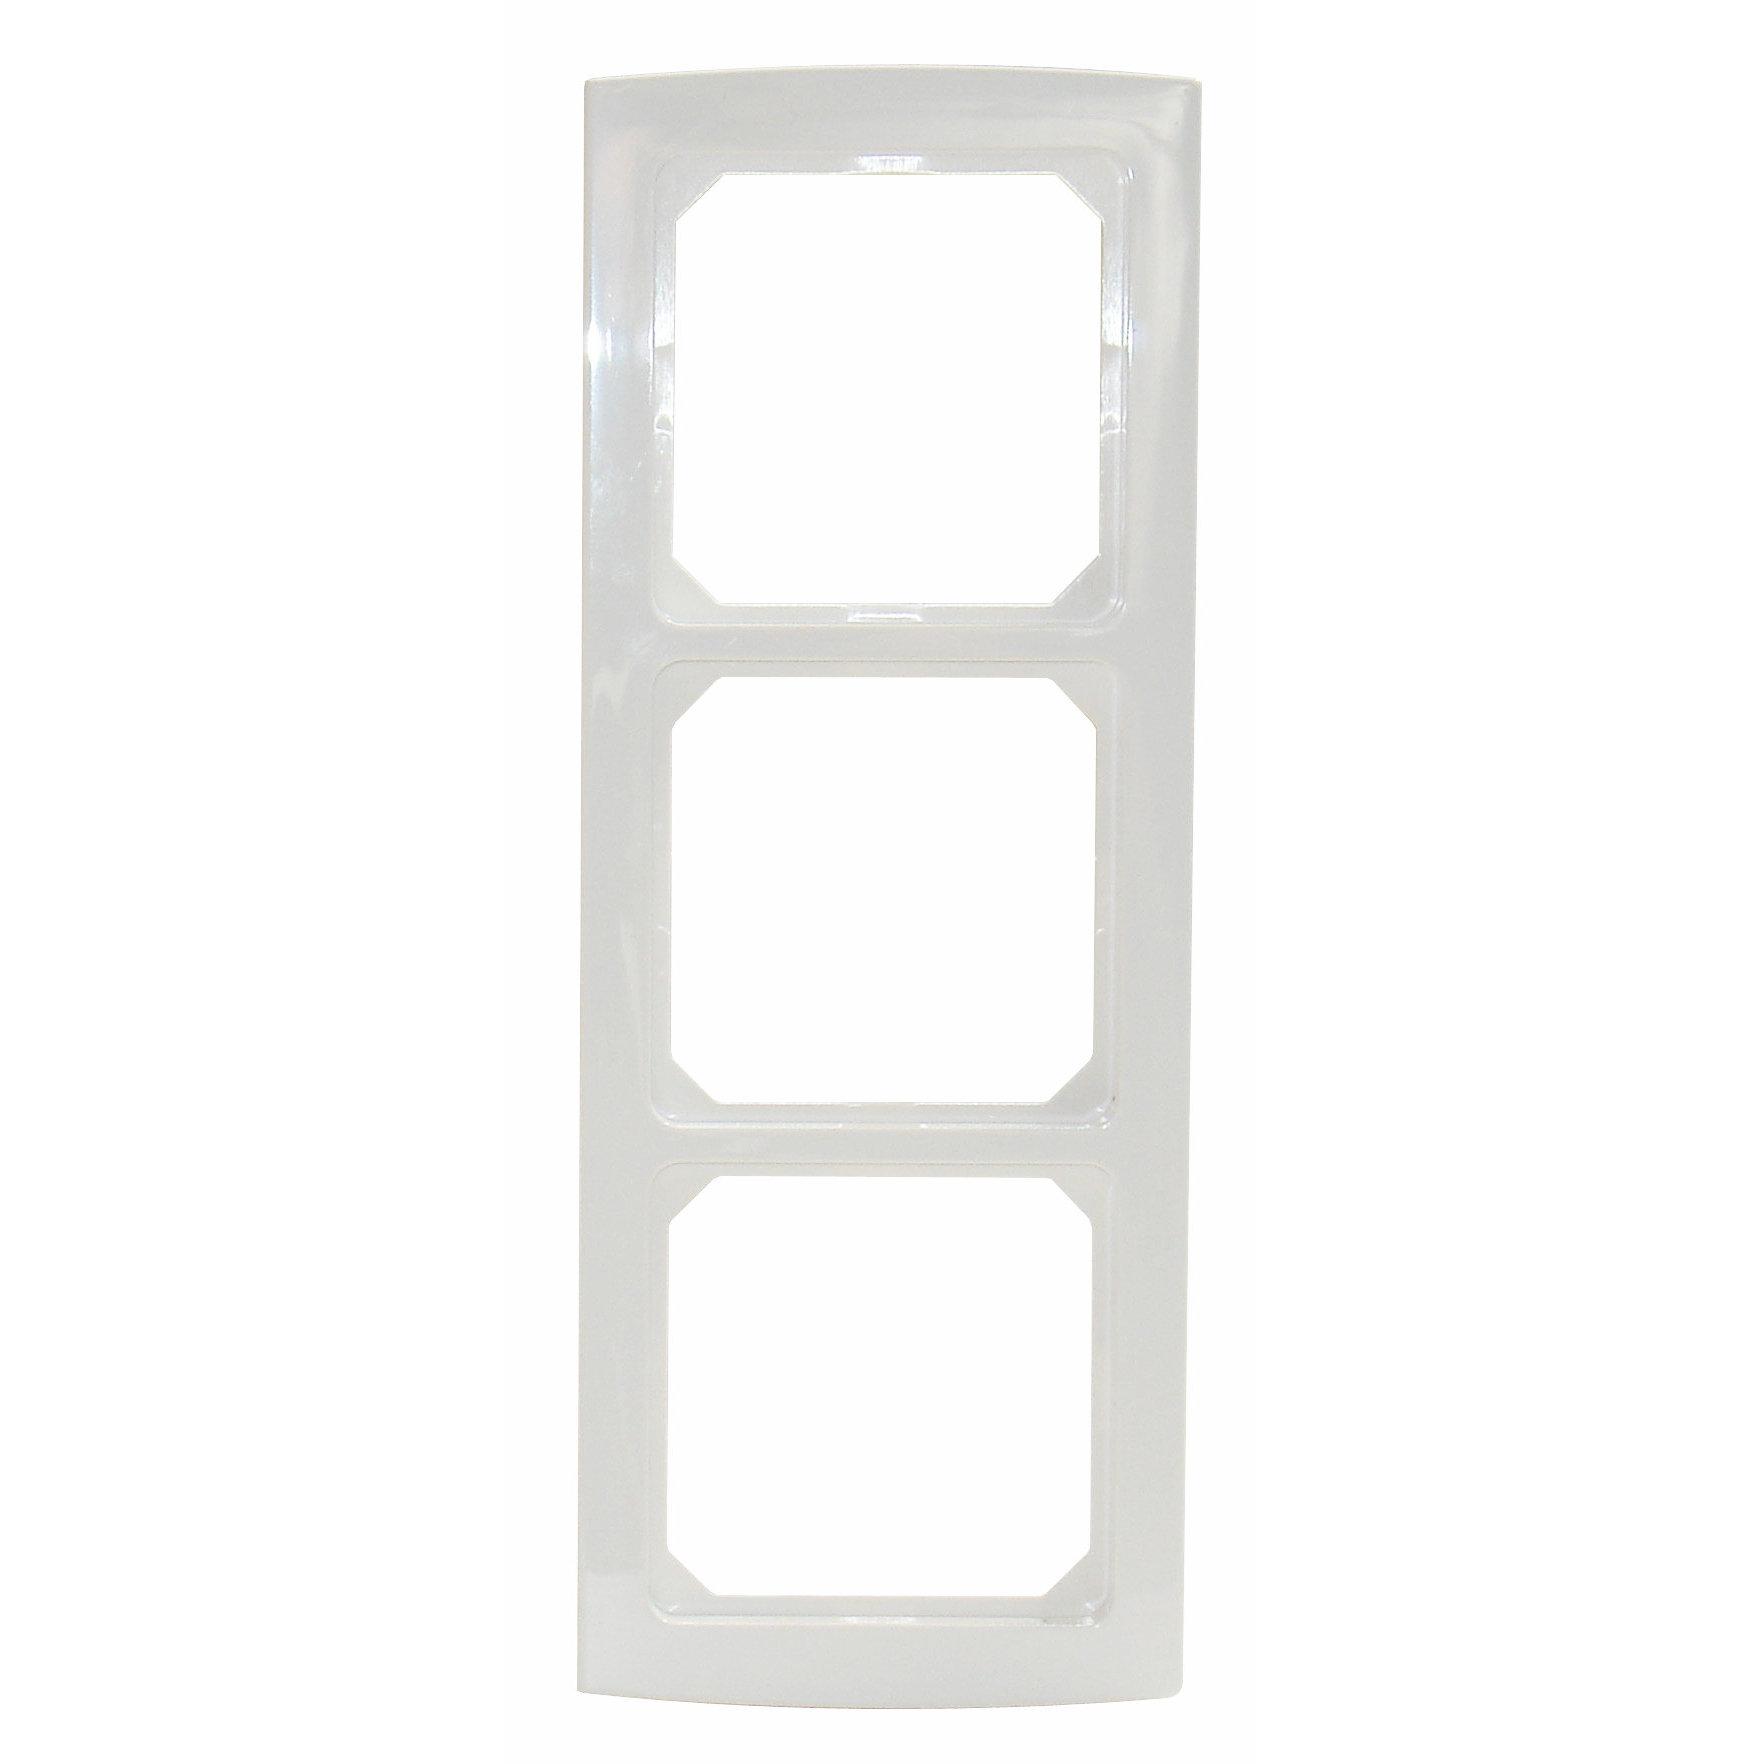 1 Stk Rahmen 3-fach, perlweiß Riva EL204320--